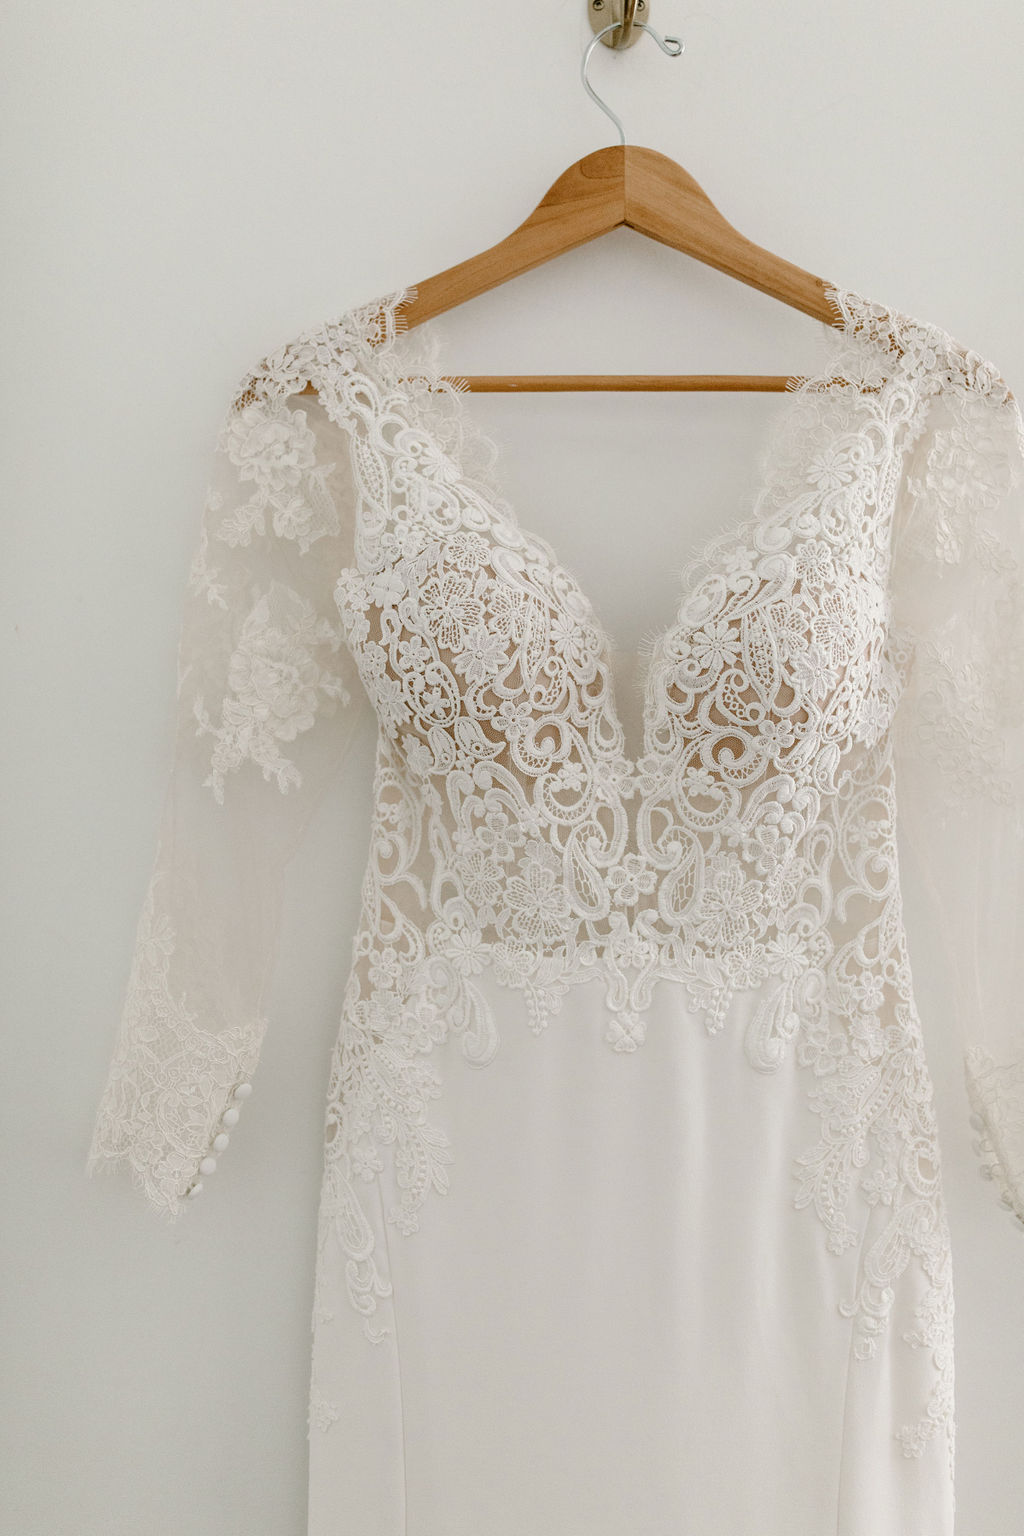 Lace long sleeve wedding dress | Nashville Bride Guide